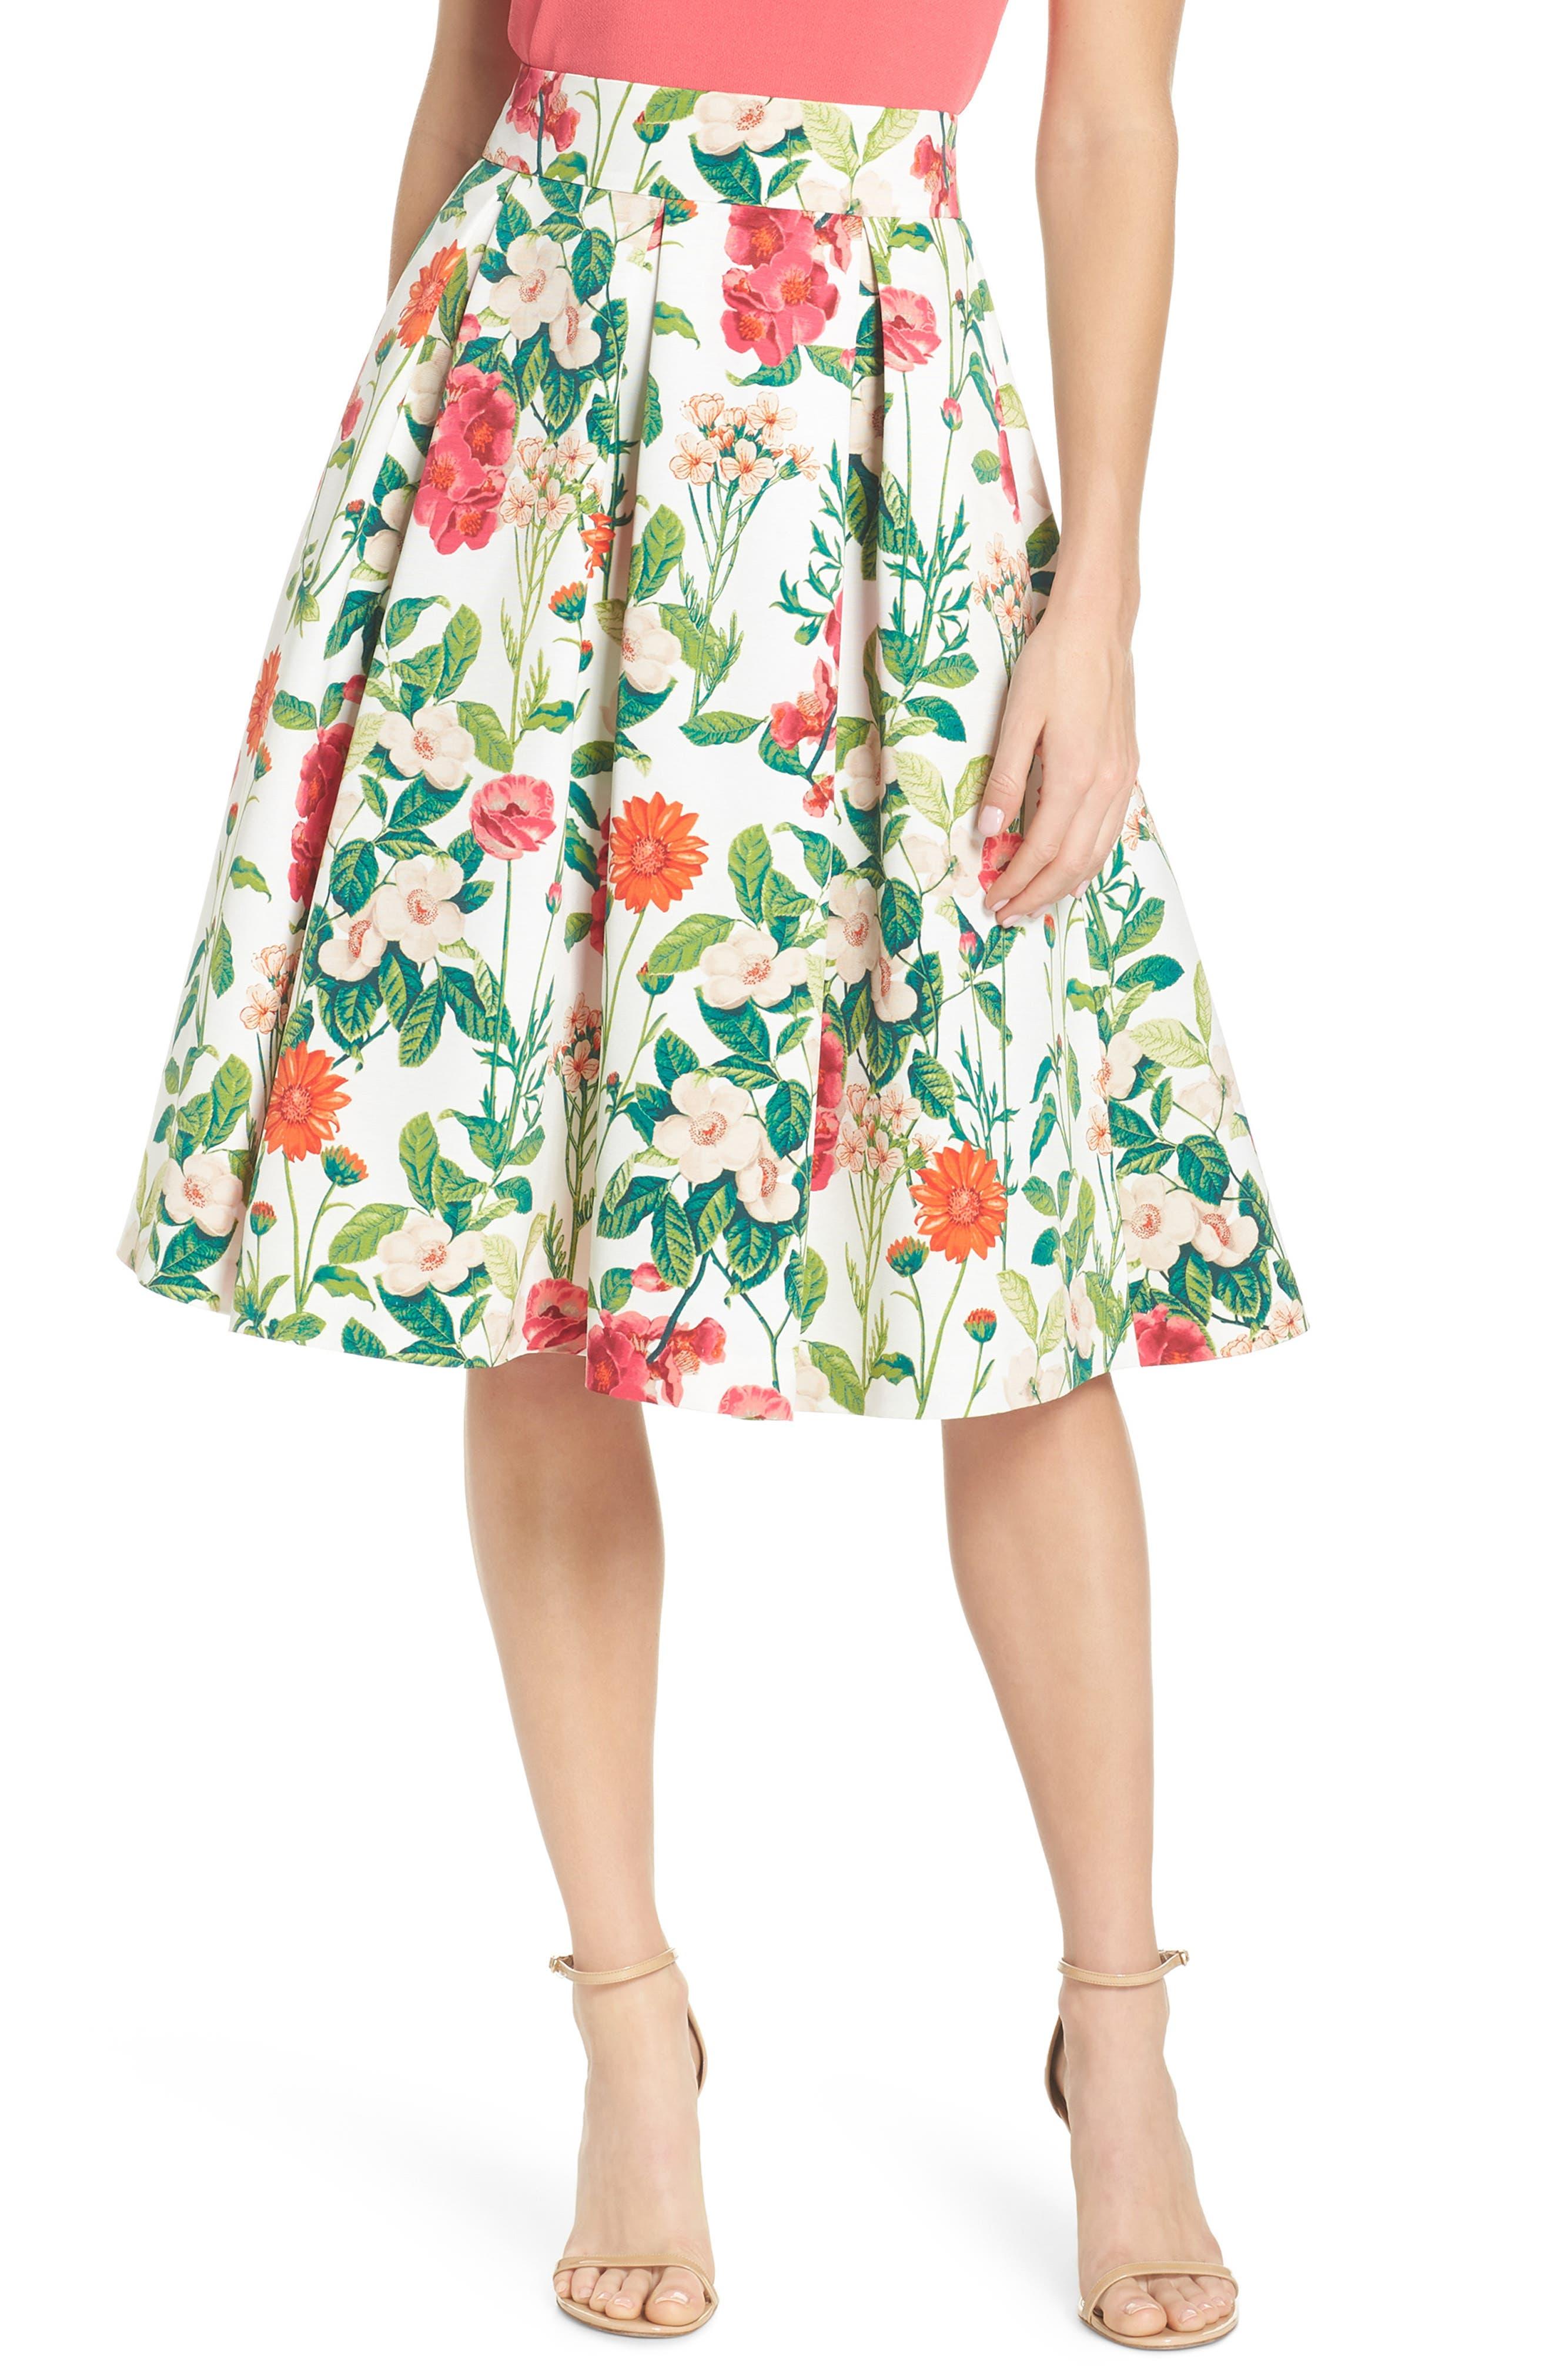 Floral A-Line Skirt,                             Main thumbnail 1, color,                             901